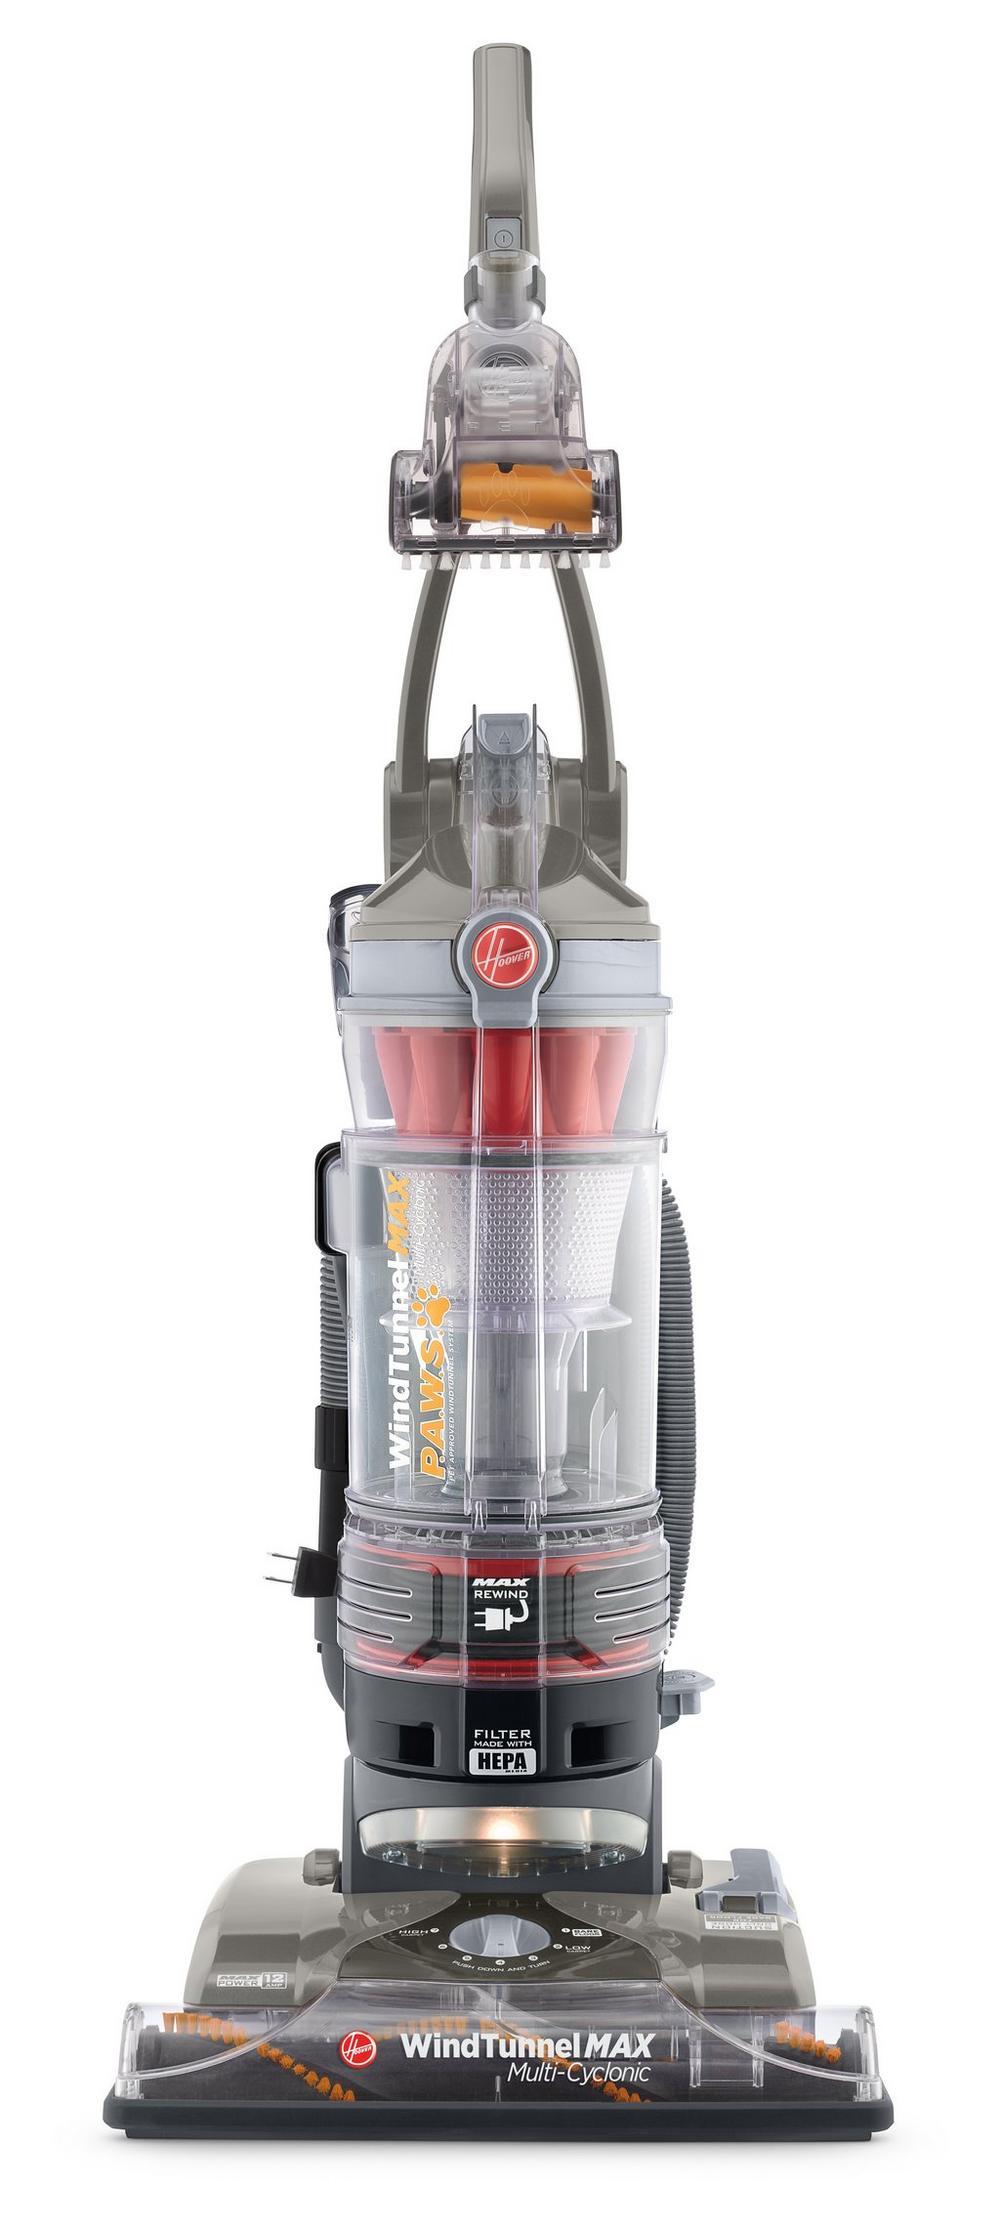 WindTunnel Max Pet T-Series Upright Vacuum1